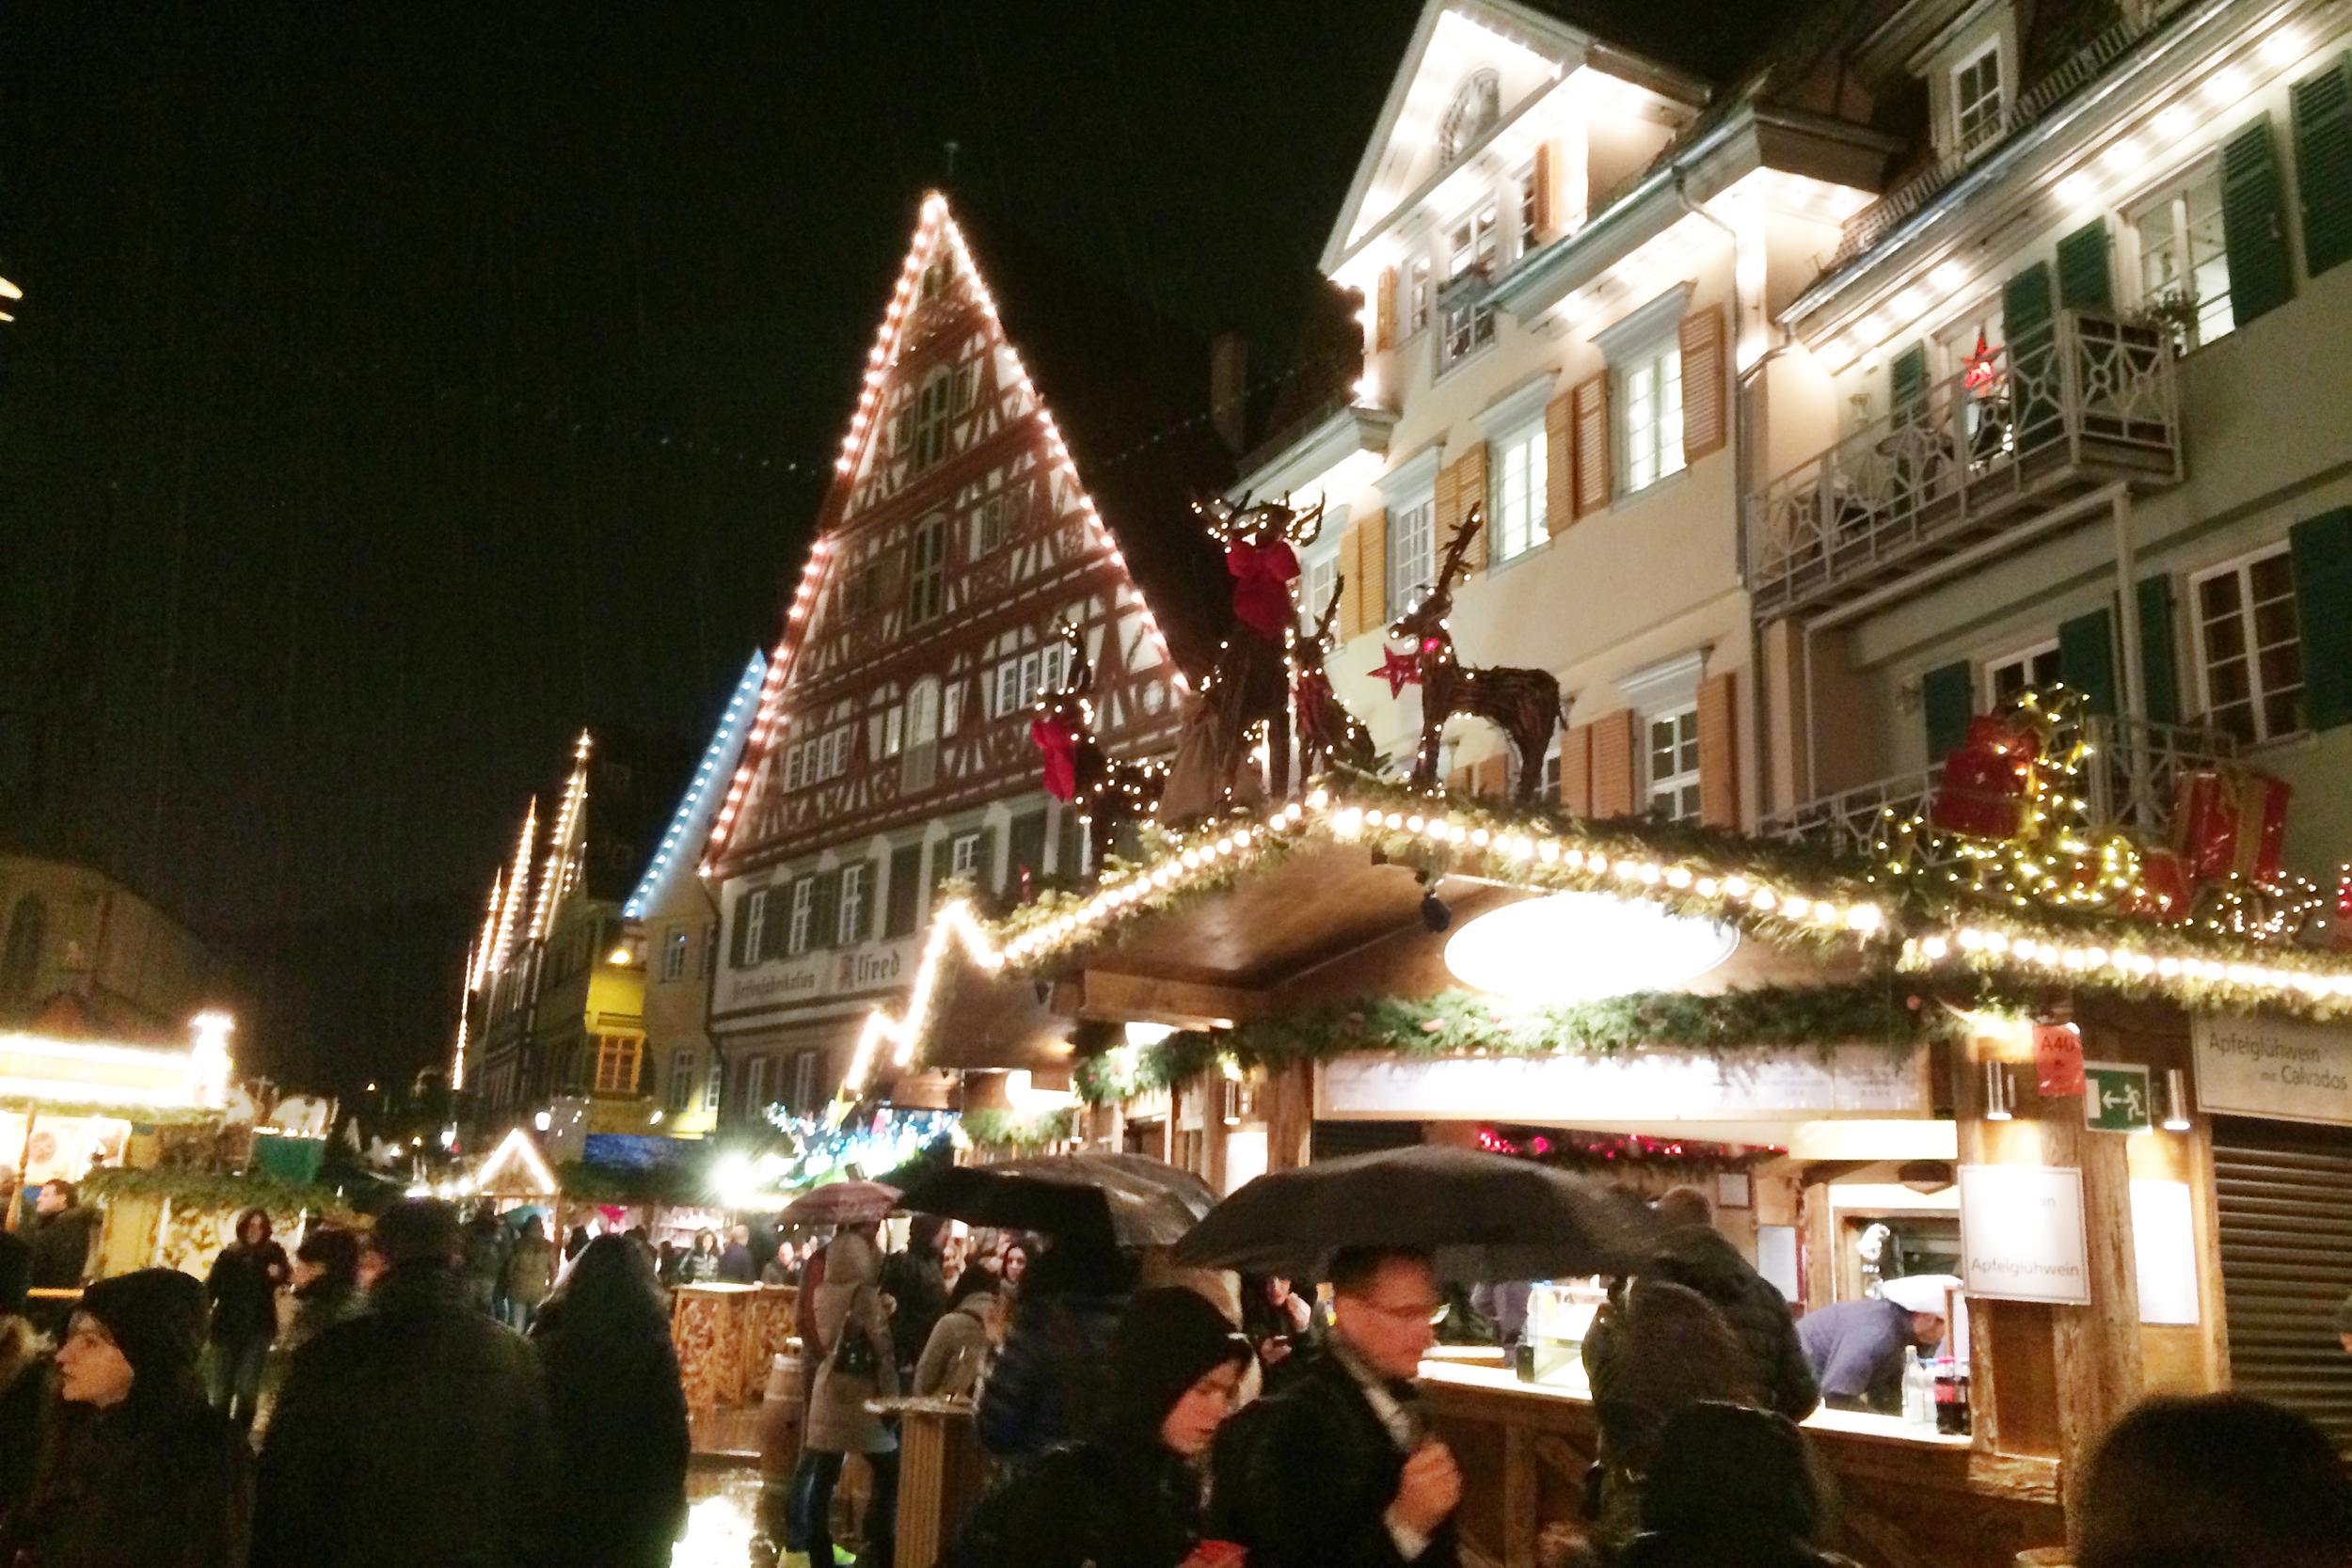 A lovely visit to Esslingen in the rain!